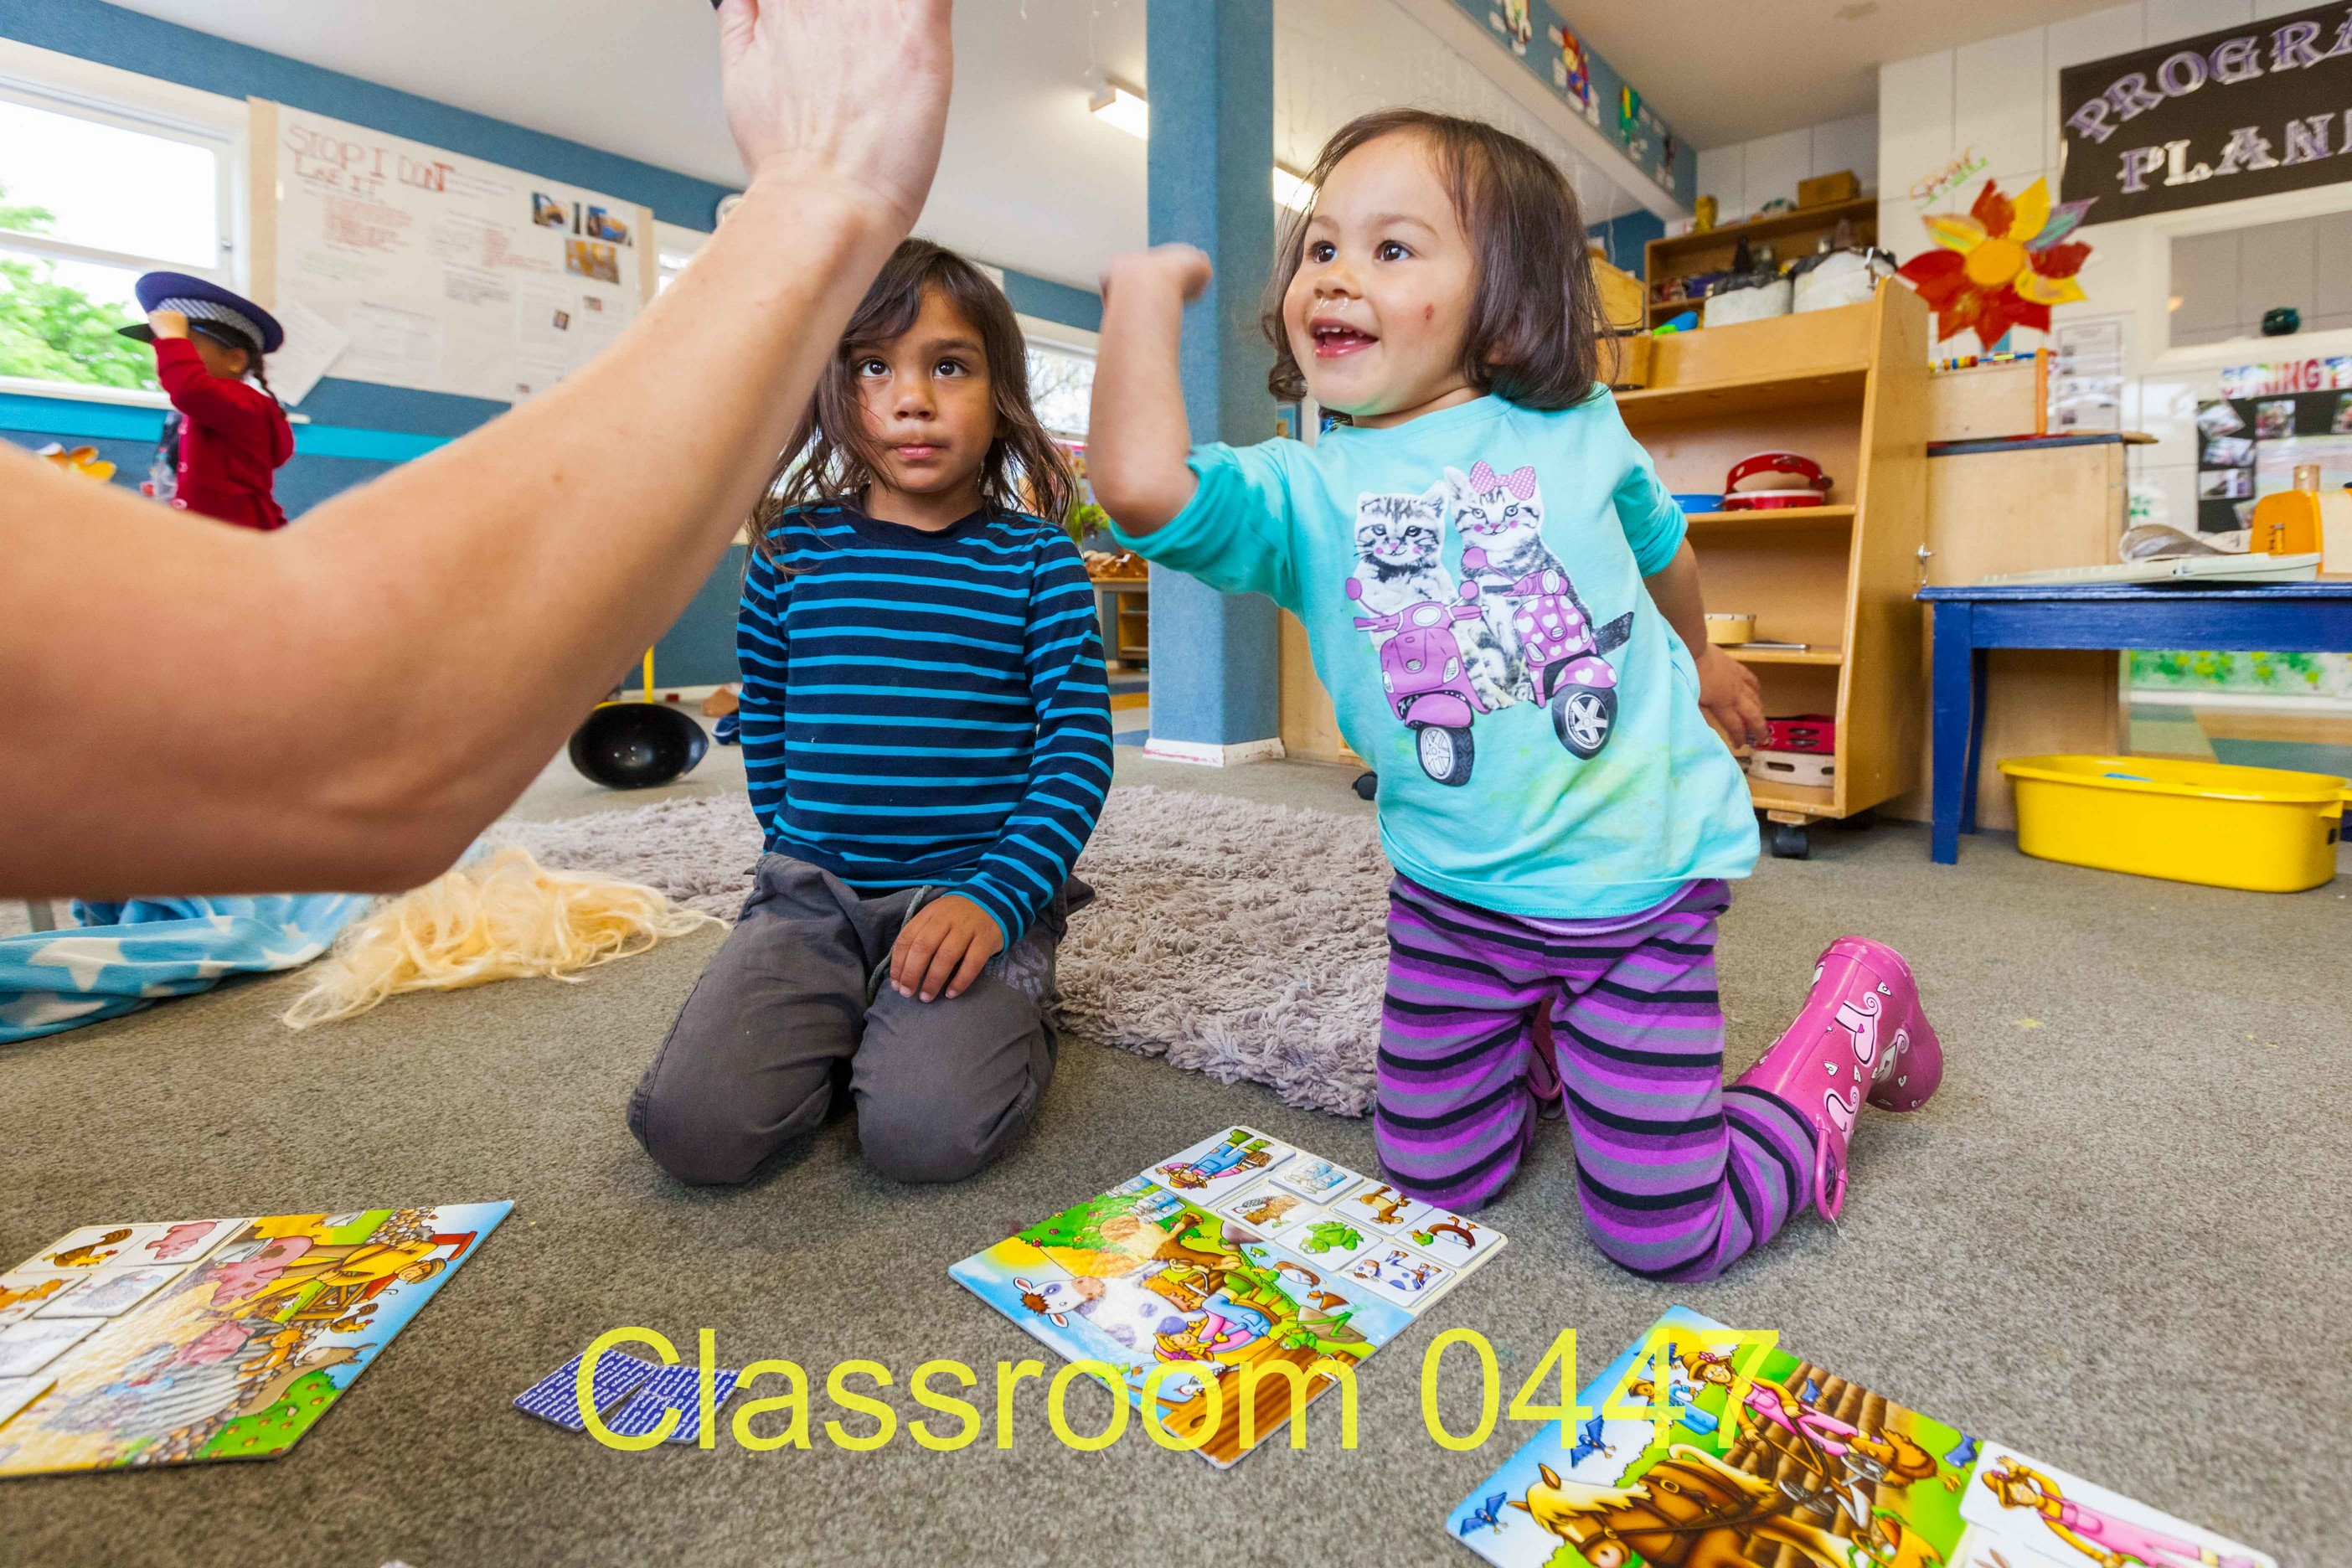 Classroom 0447